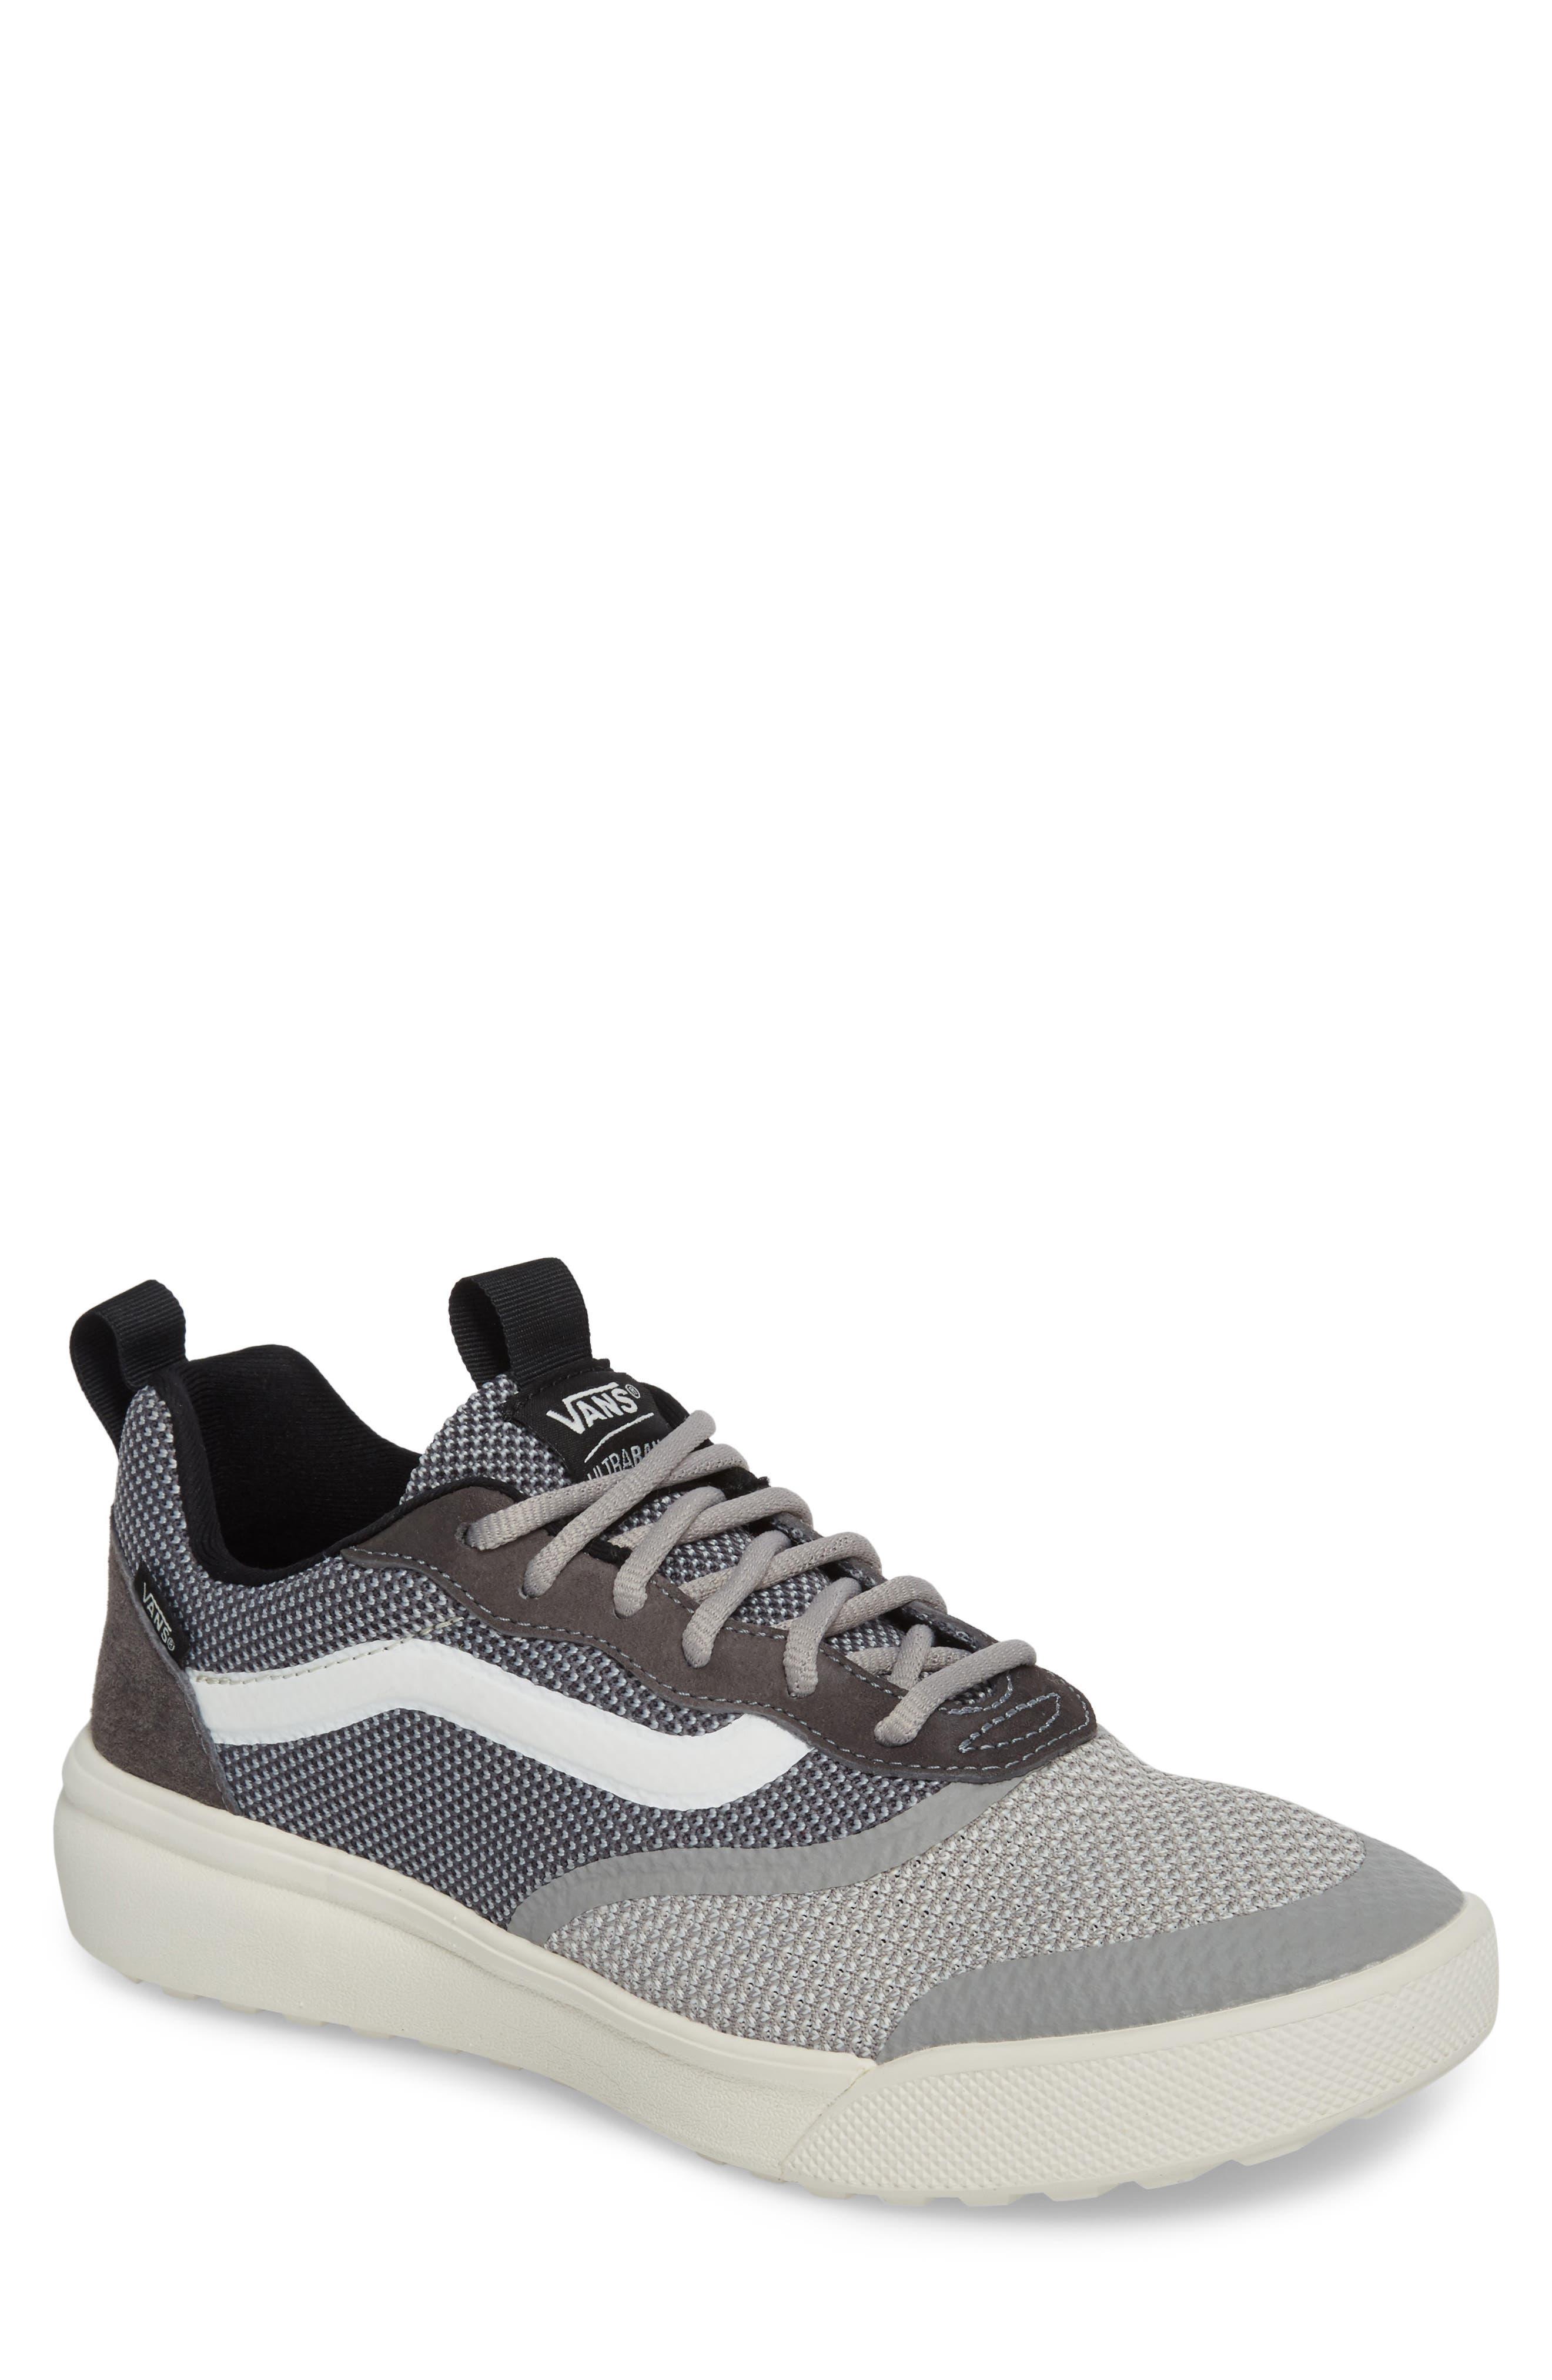 UltraRange DX Low Top Sneaker,                             Main thumbnail 1, color,                             021